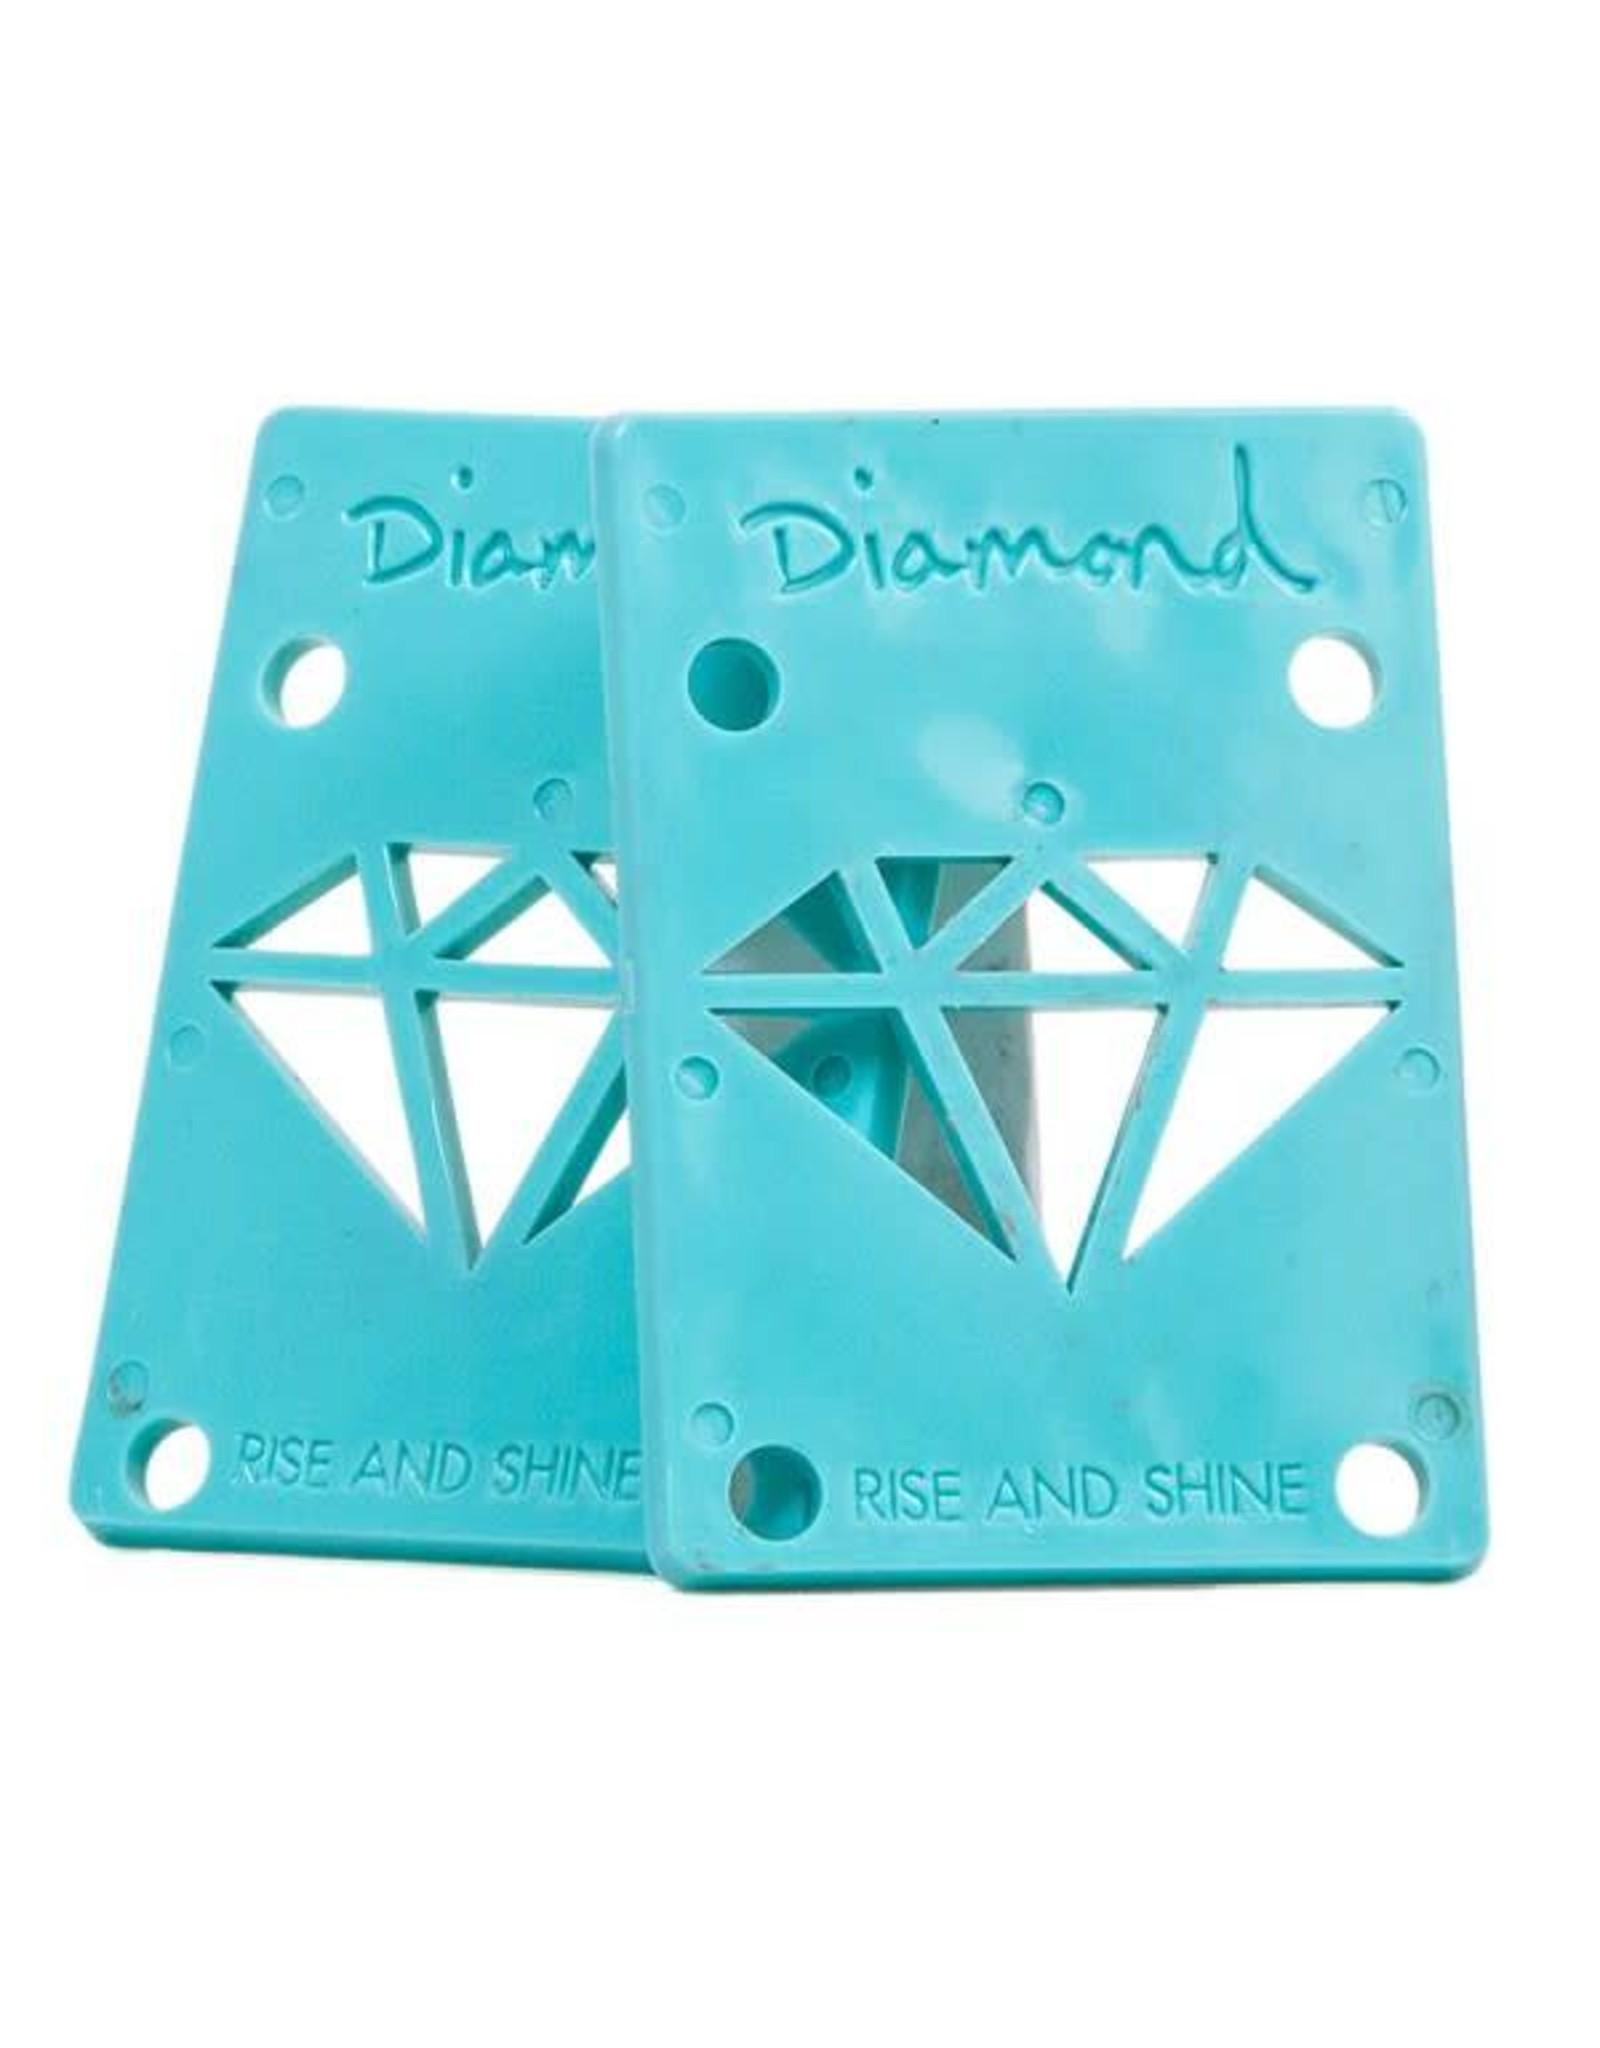 Diamond Rise & Shine Pads 0.125inch One Size